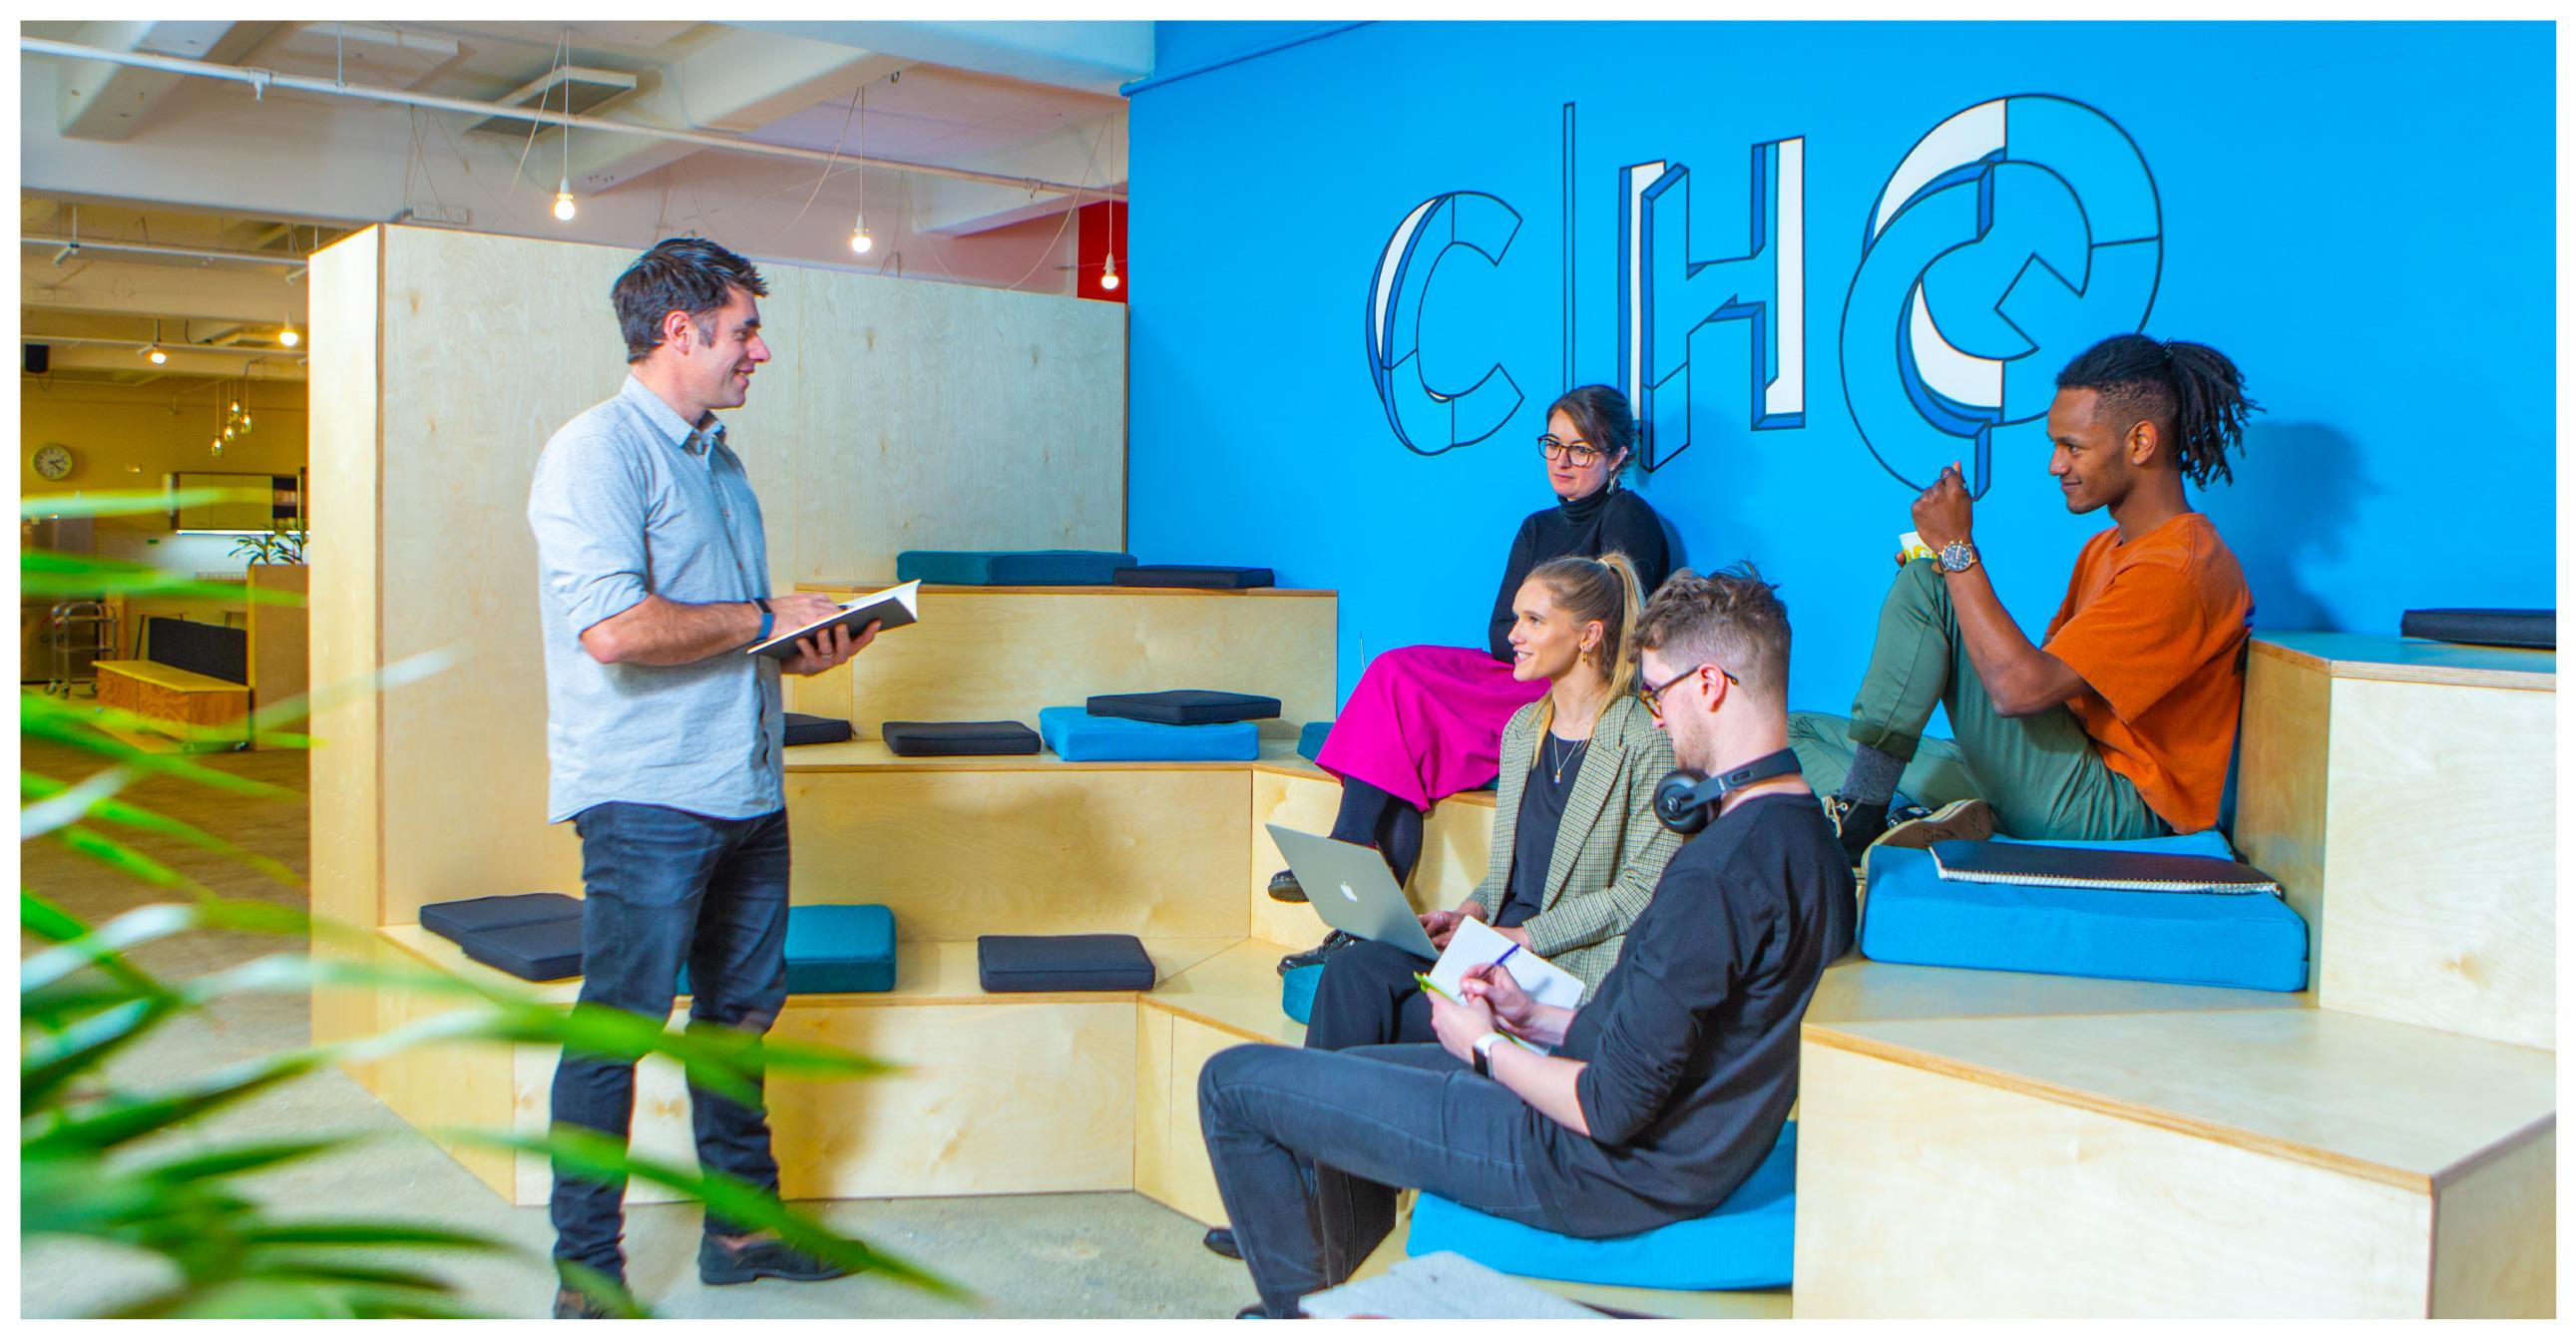 chq-headquarters-design-web-13.jpg